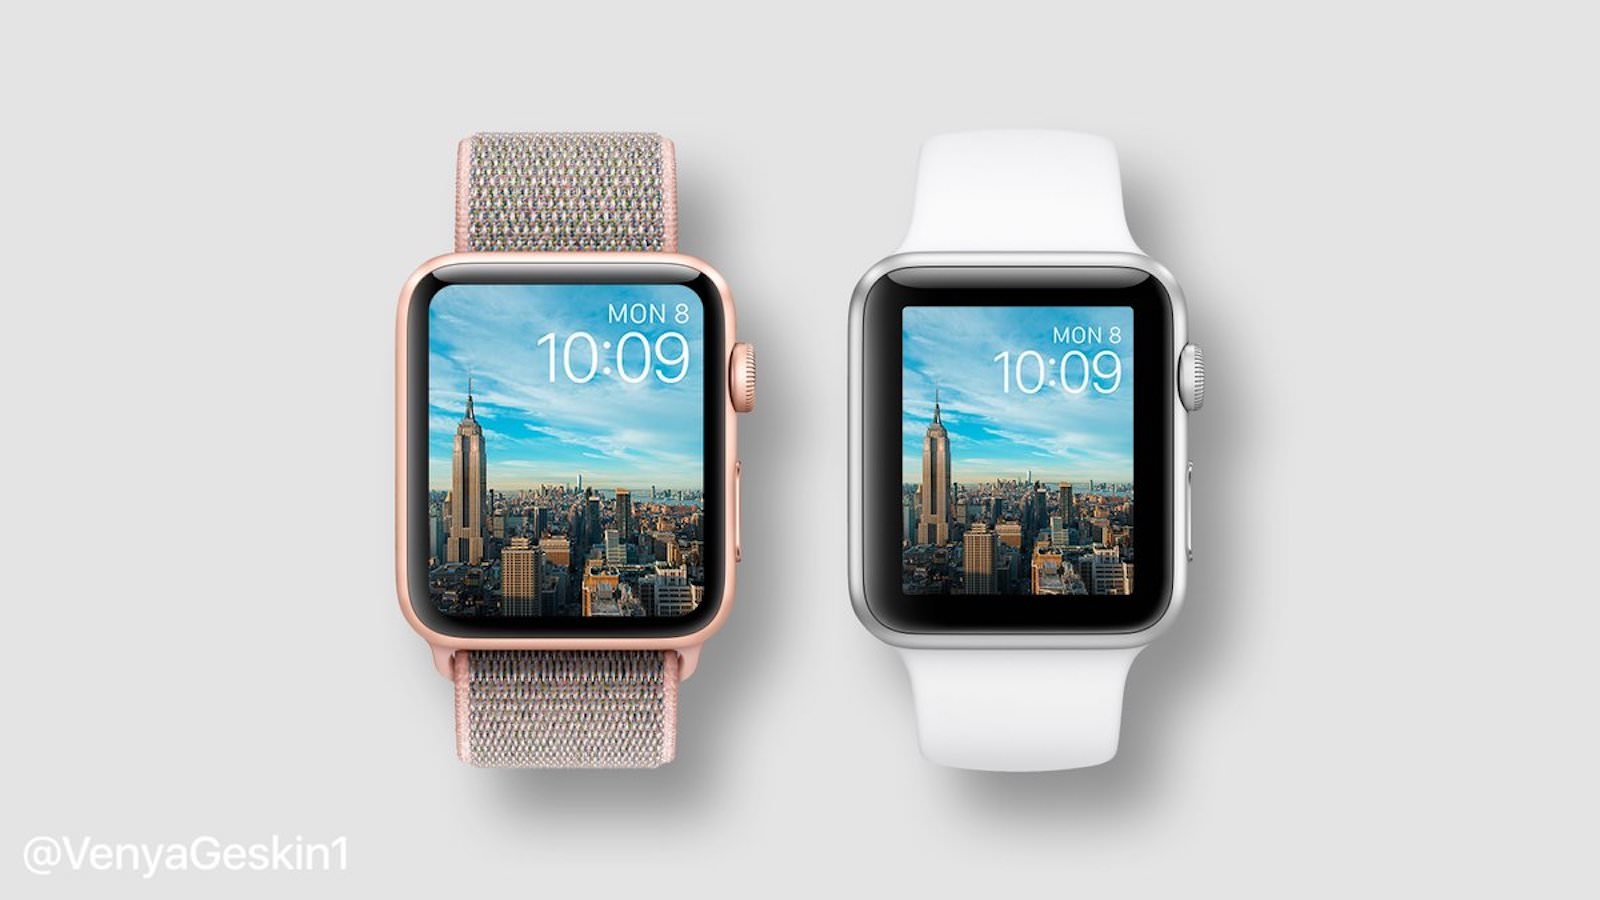 Apple-Watch-Series-4-Concept-image-2.jpg